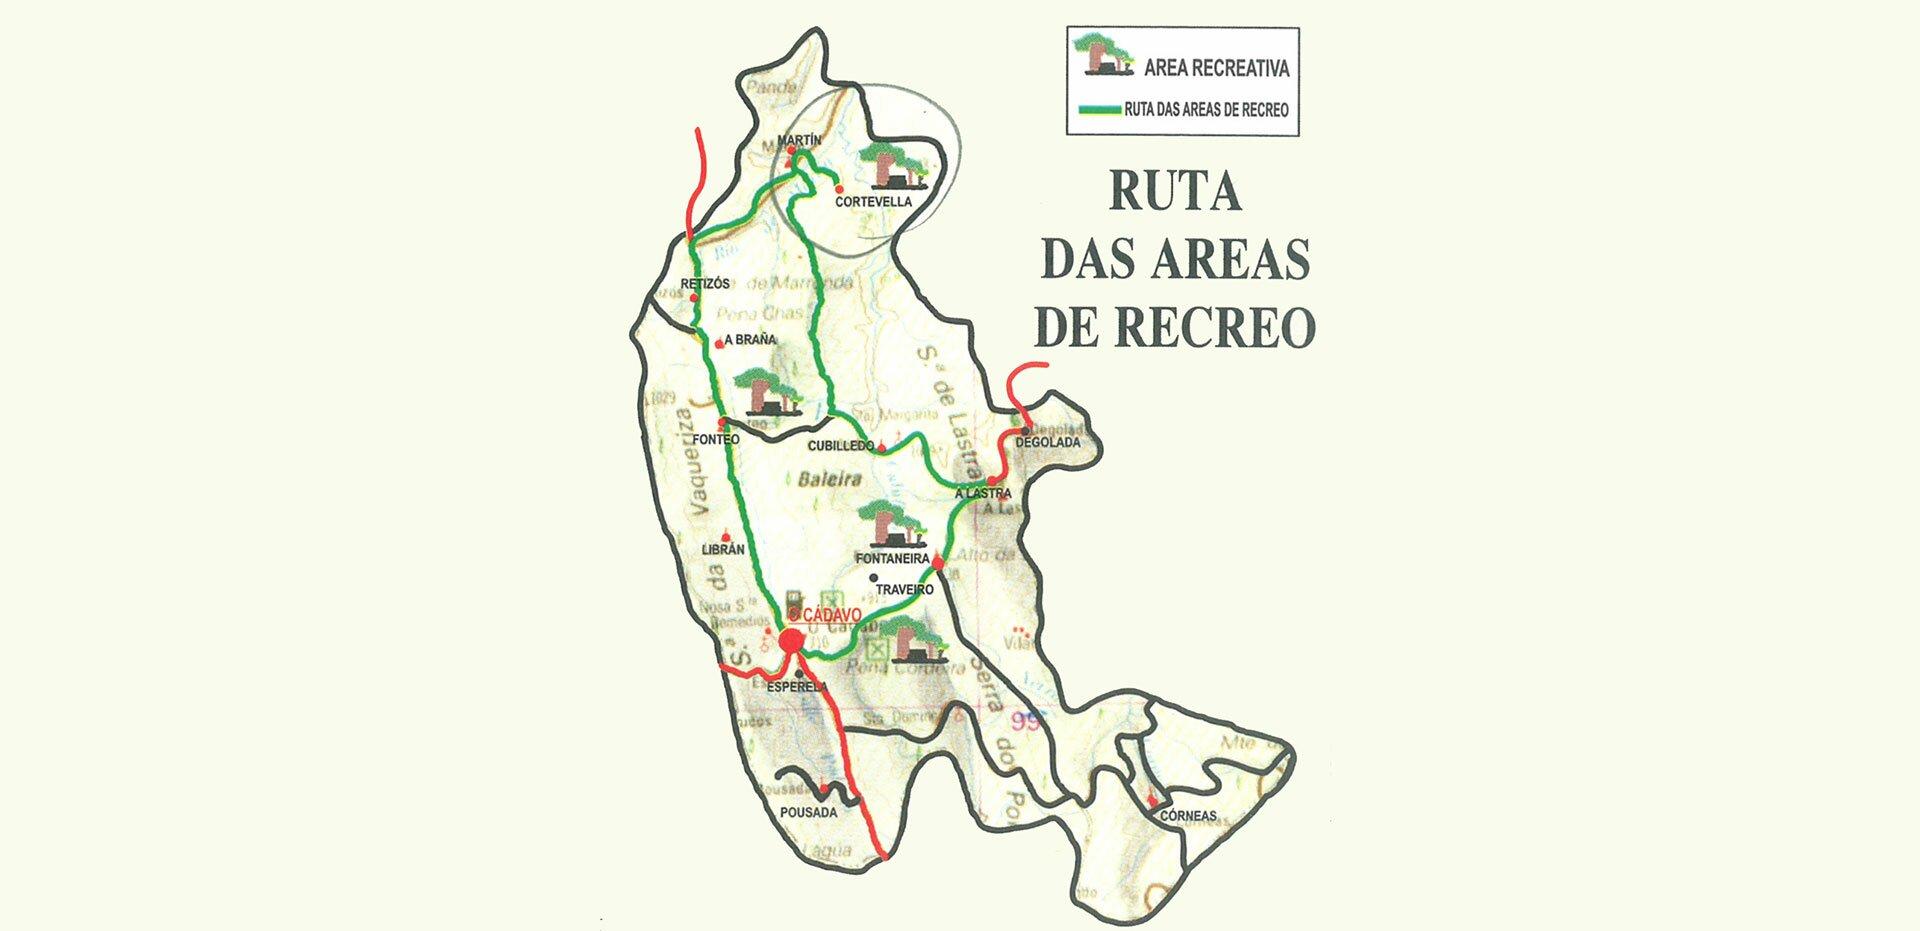 ruta-areas-de-recreo